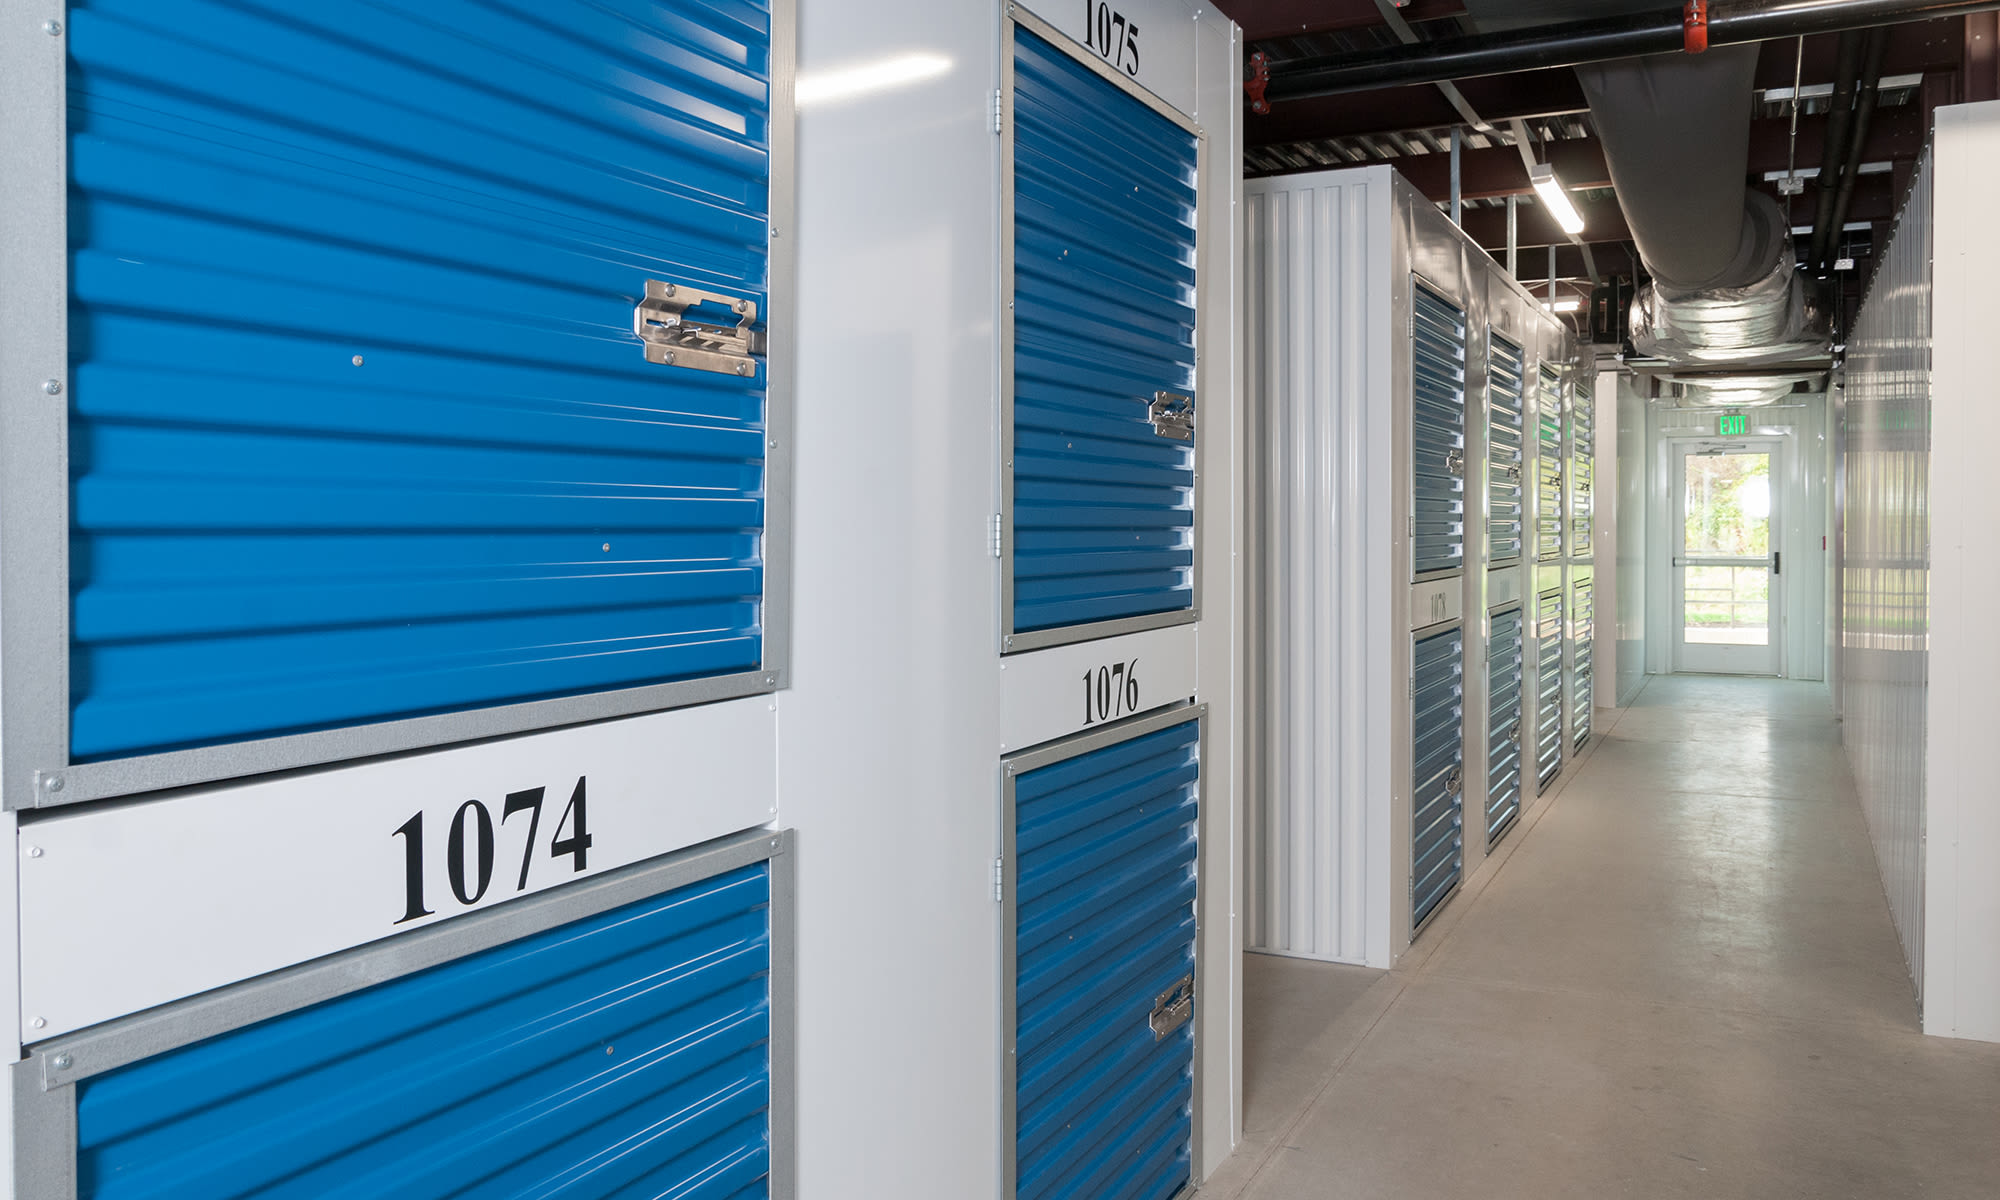 Small Locker Sized Units at Virginia Varsity Self Storage in Roanoke, Virginia is located